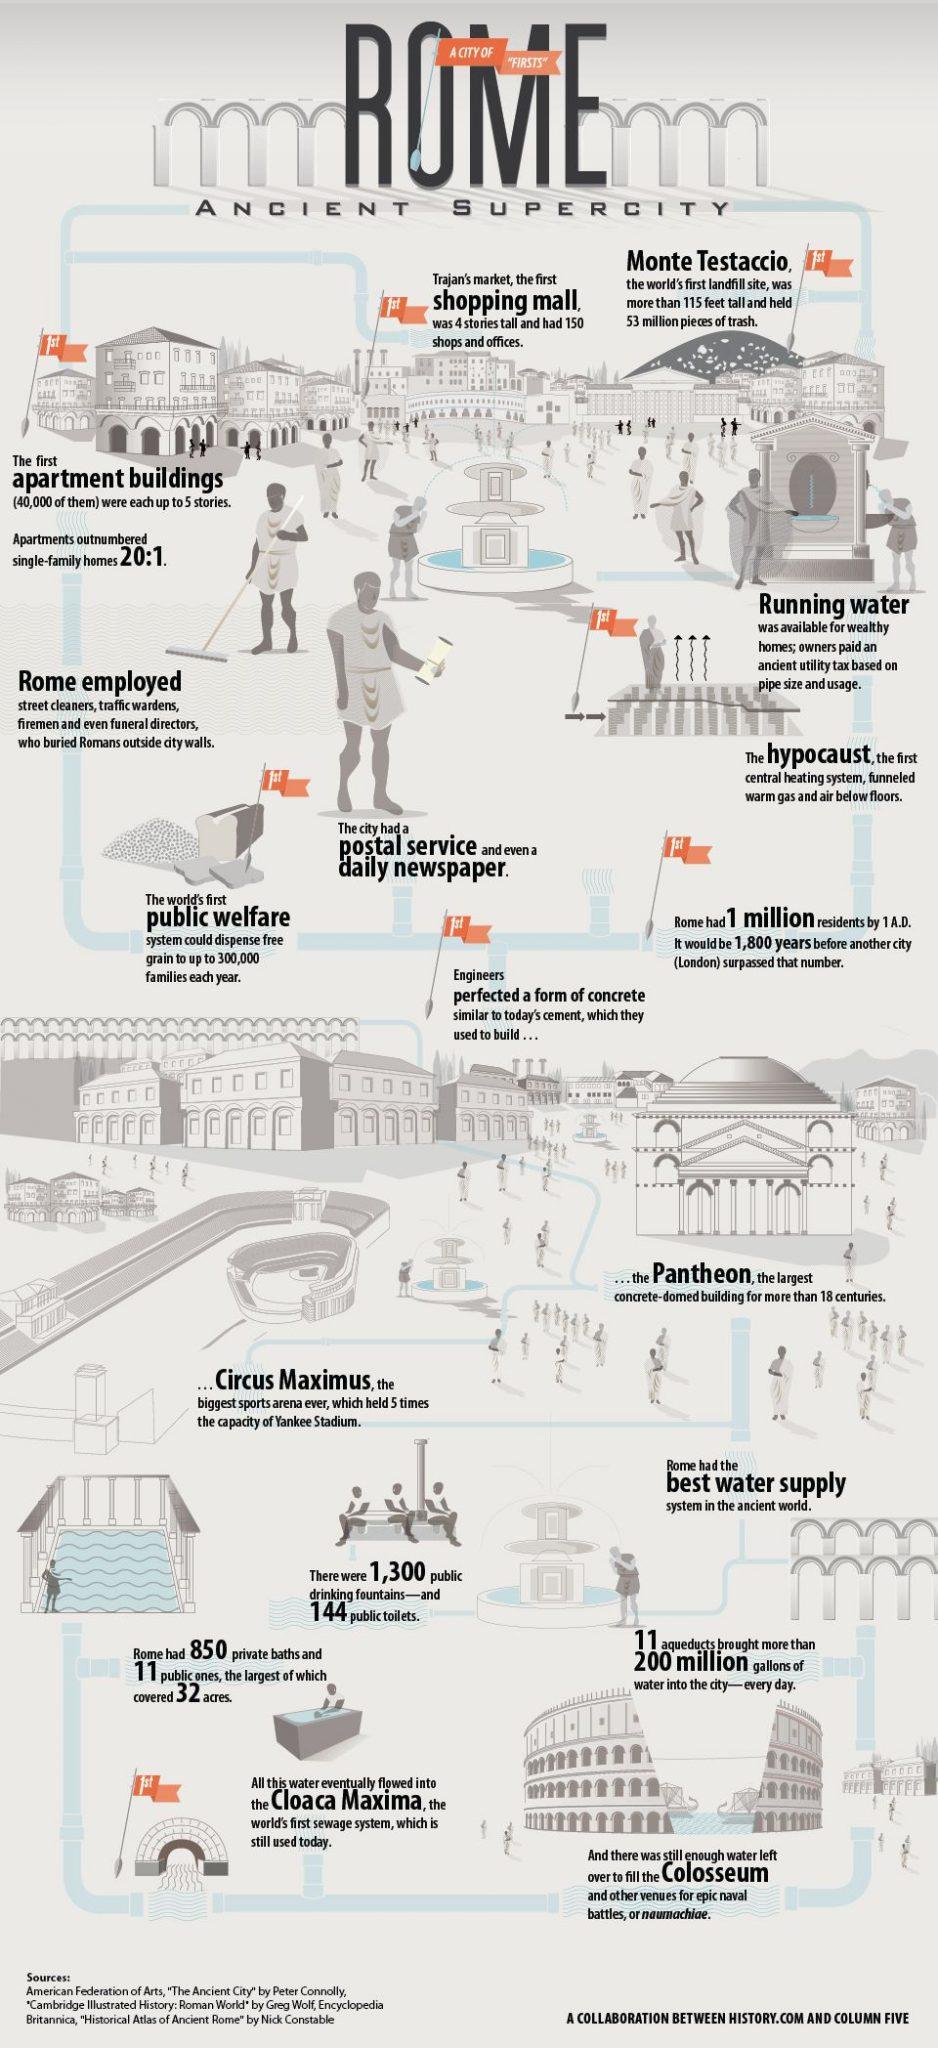 Datos de la ciudad eterna, la antigua Roma, Infografia - Curiosidades de la Historia